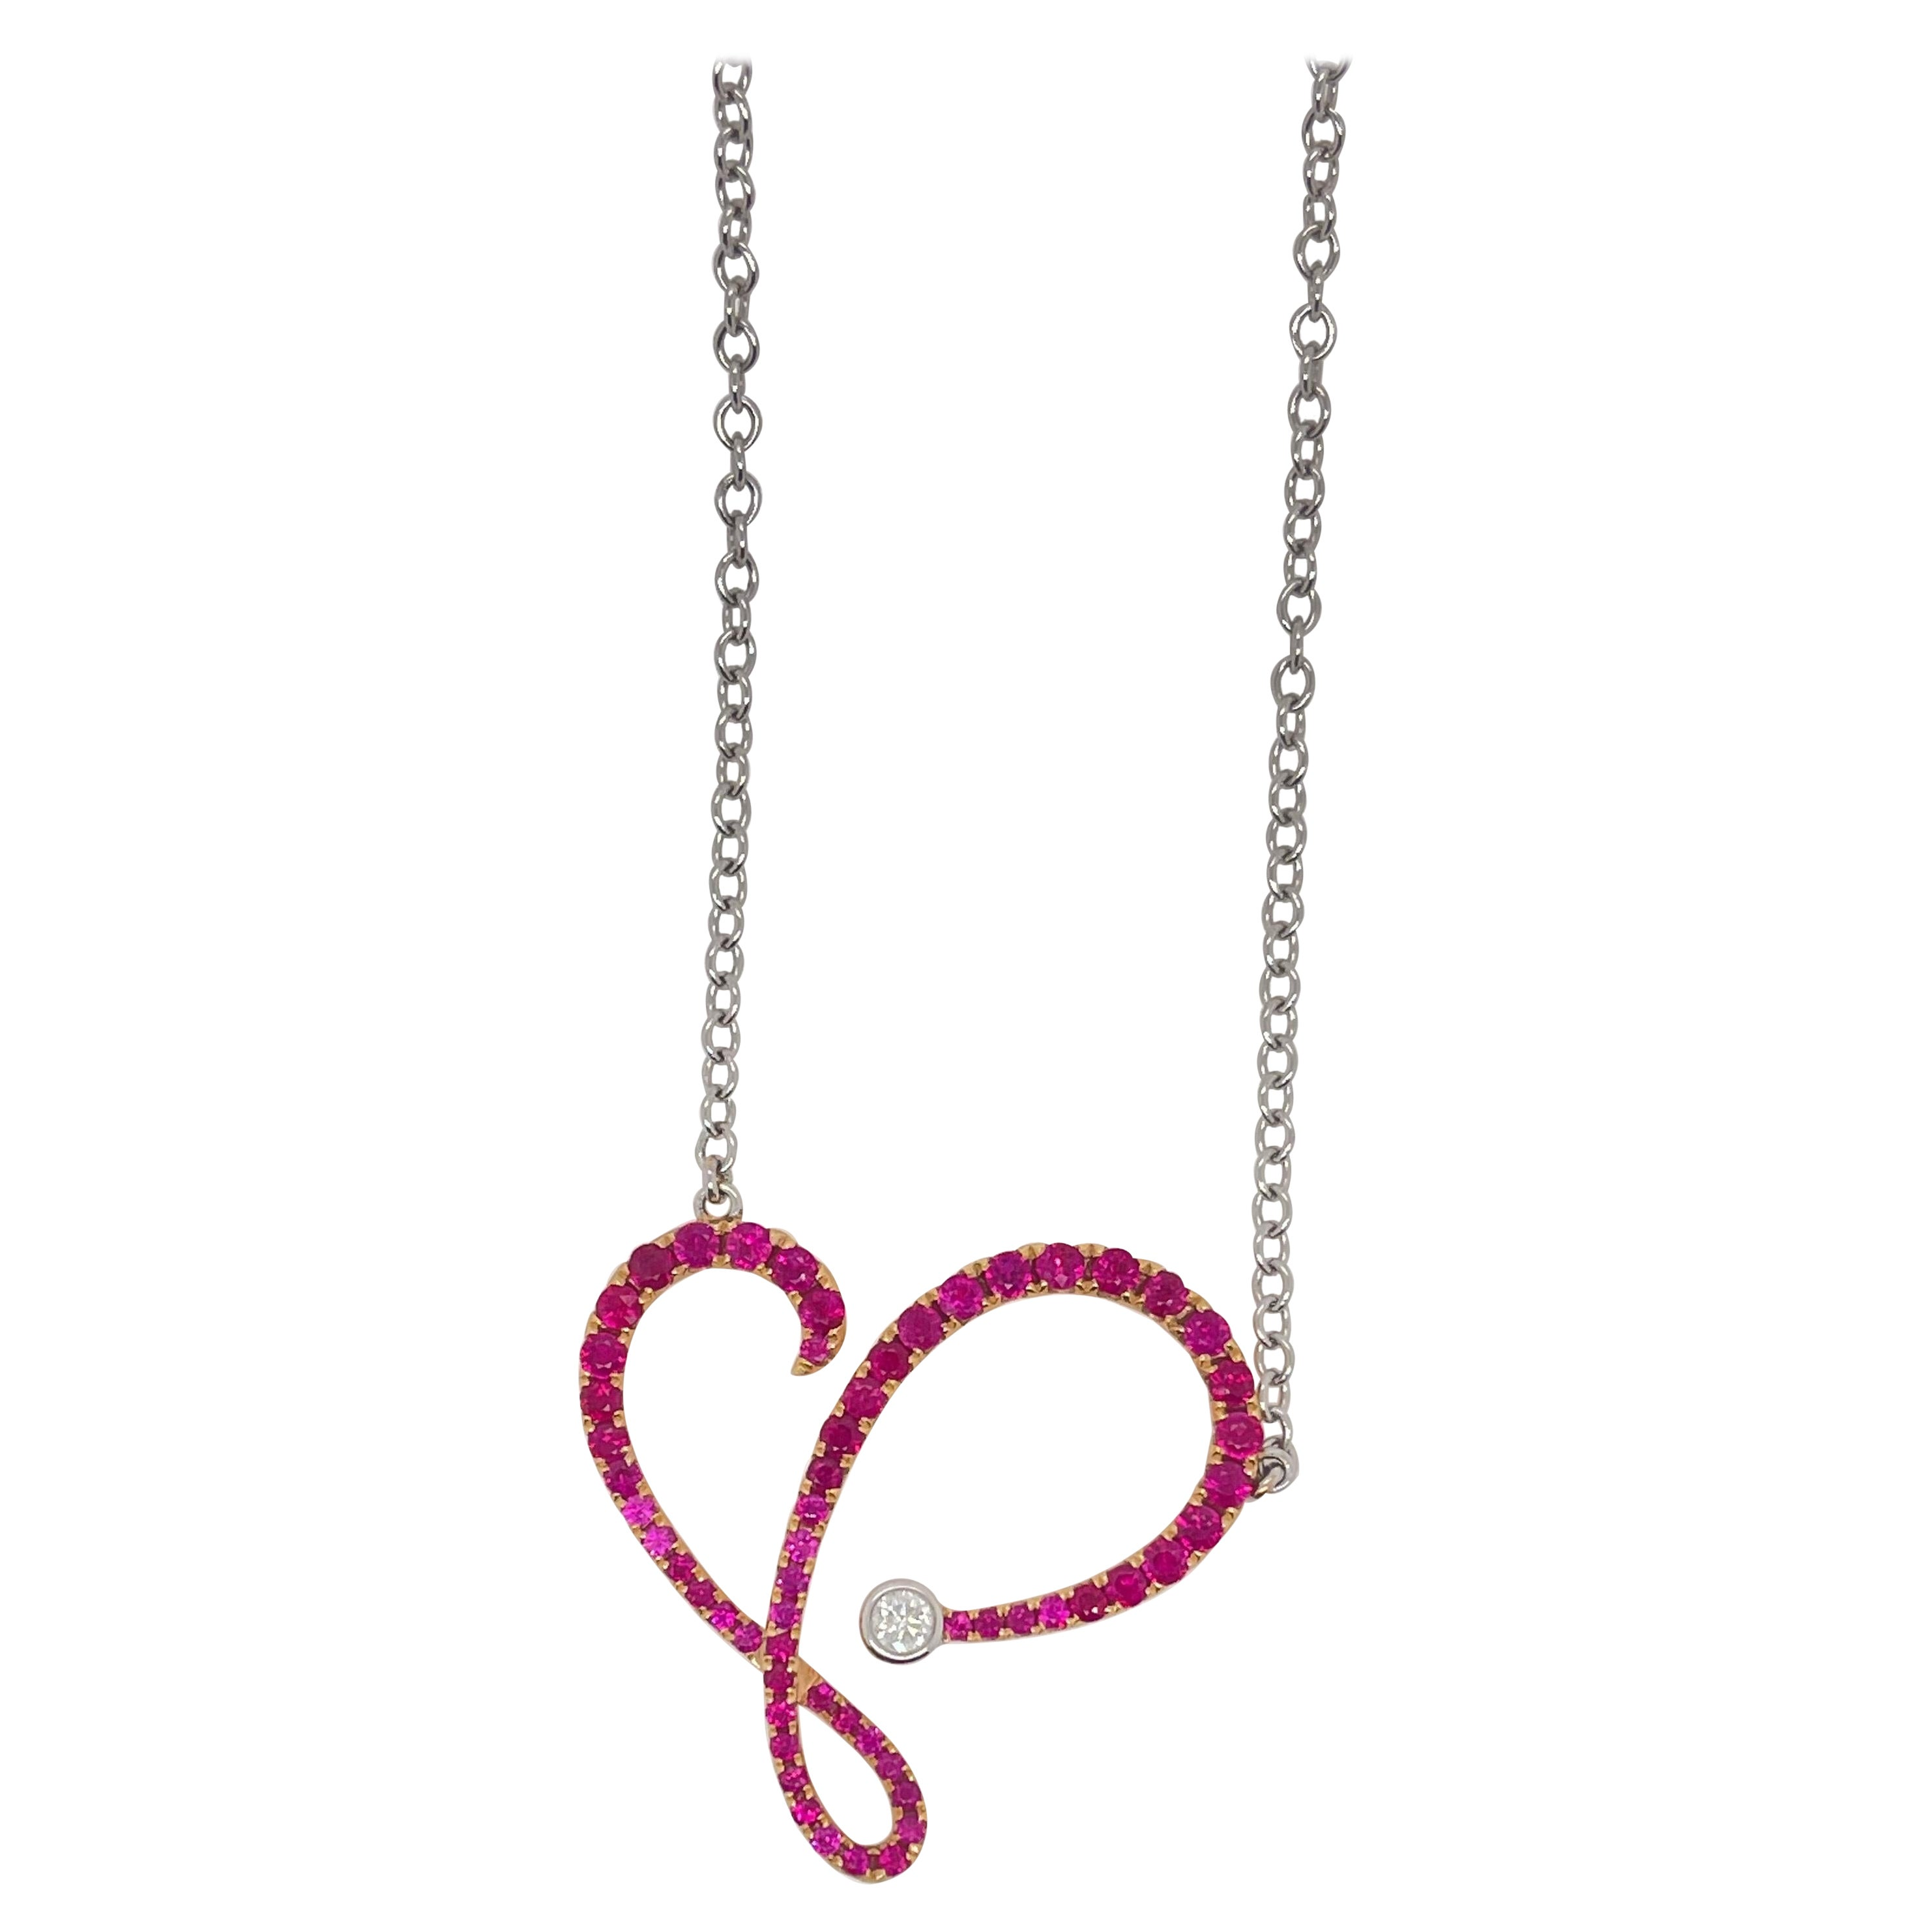 White Gold Ruby & Diamond Swirl Pendant Necklace